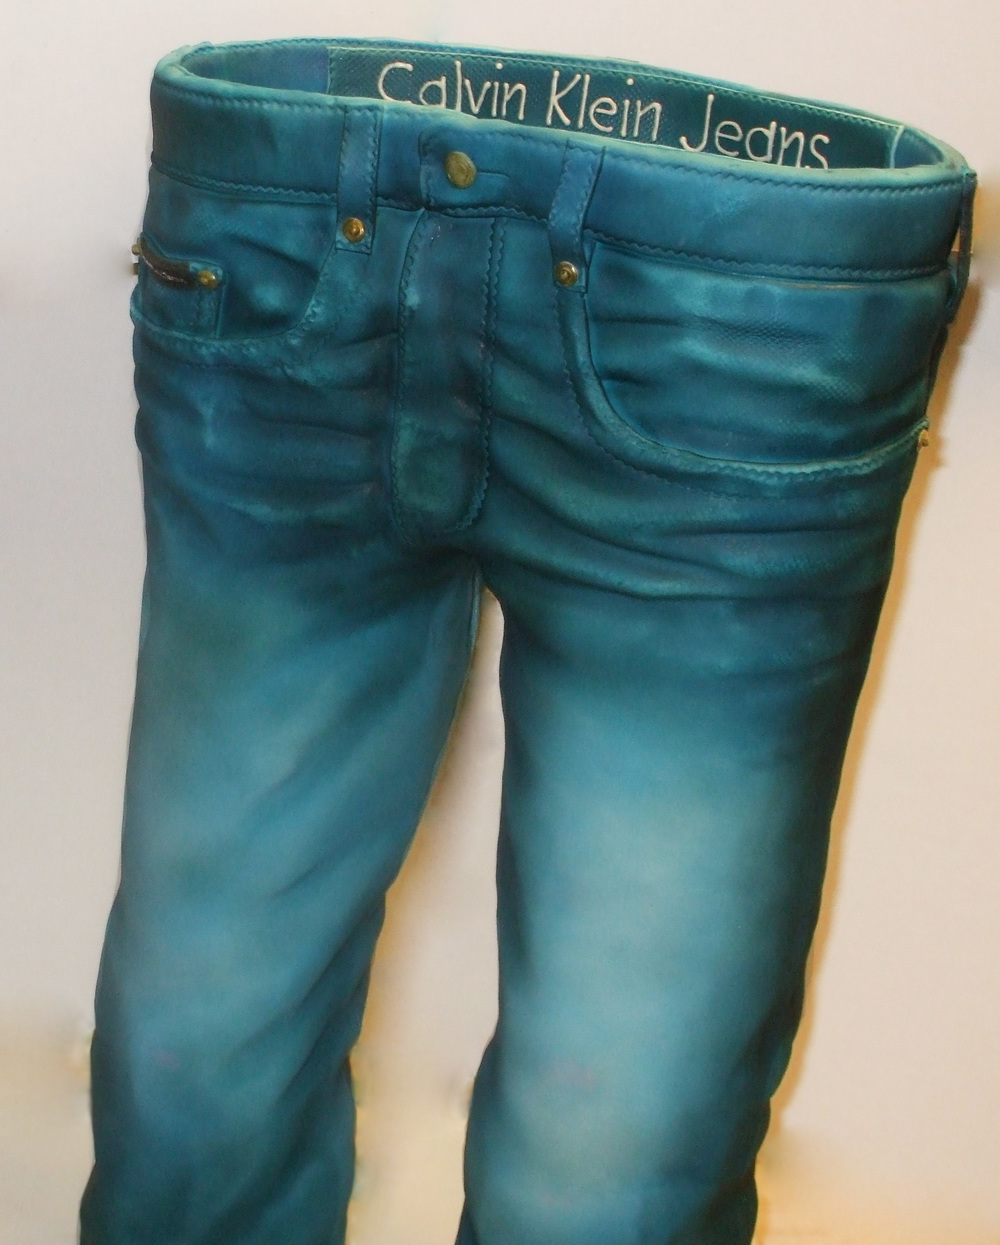 jeans 15.jpg